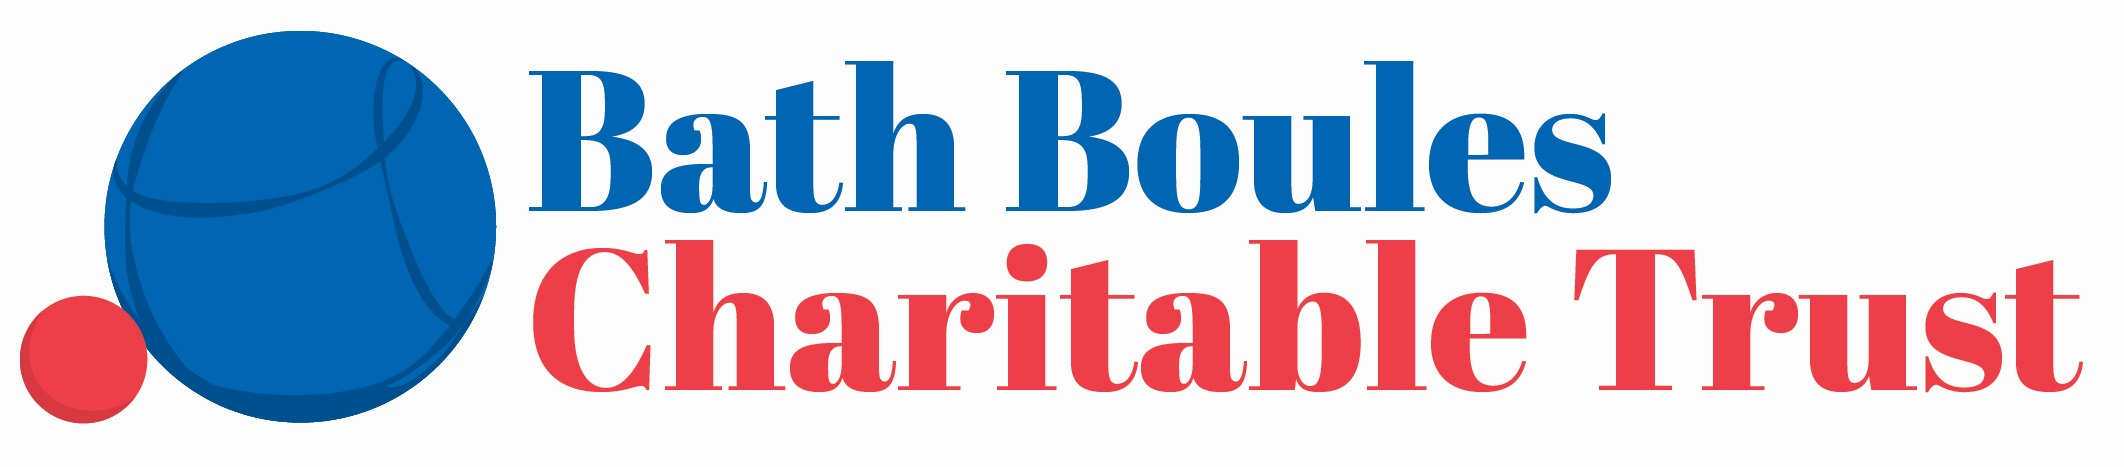 Bath Boules Charitable Trust